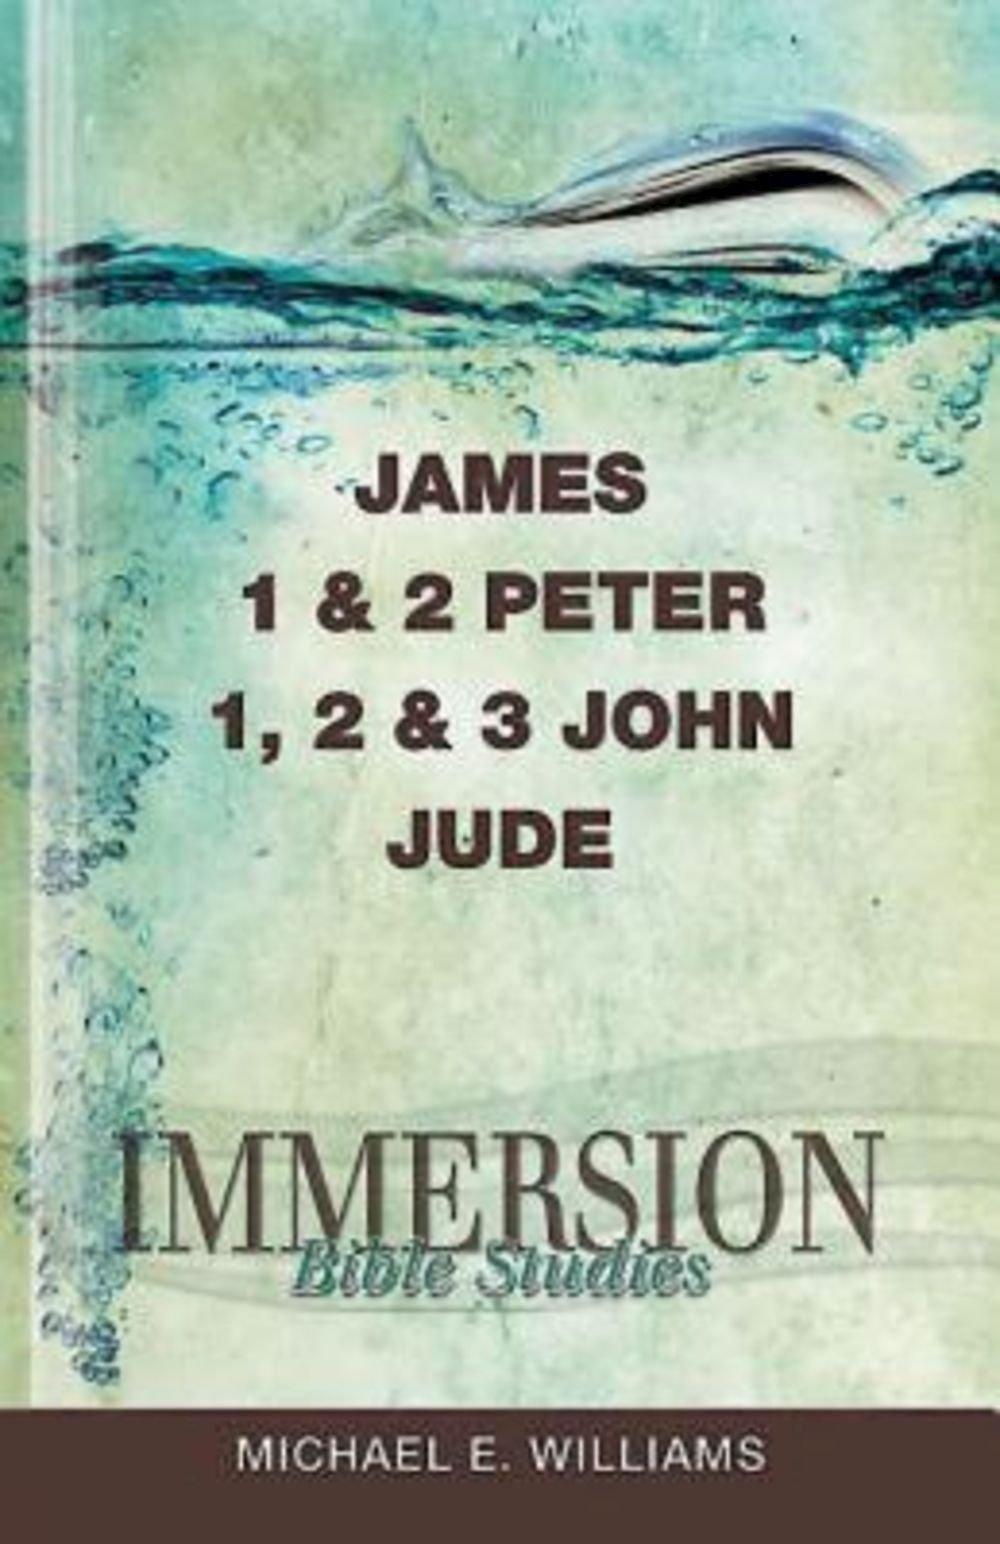 Read Online Immersion Bible Studies: James, 1 & 2 Peter, 1, 2 & 3 John, Jude ebook